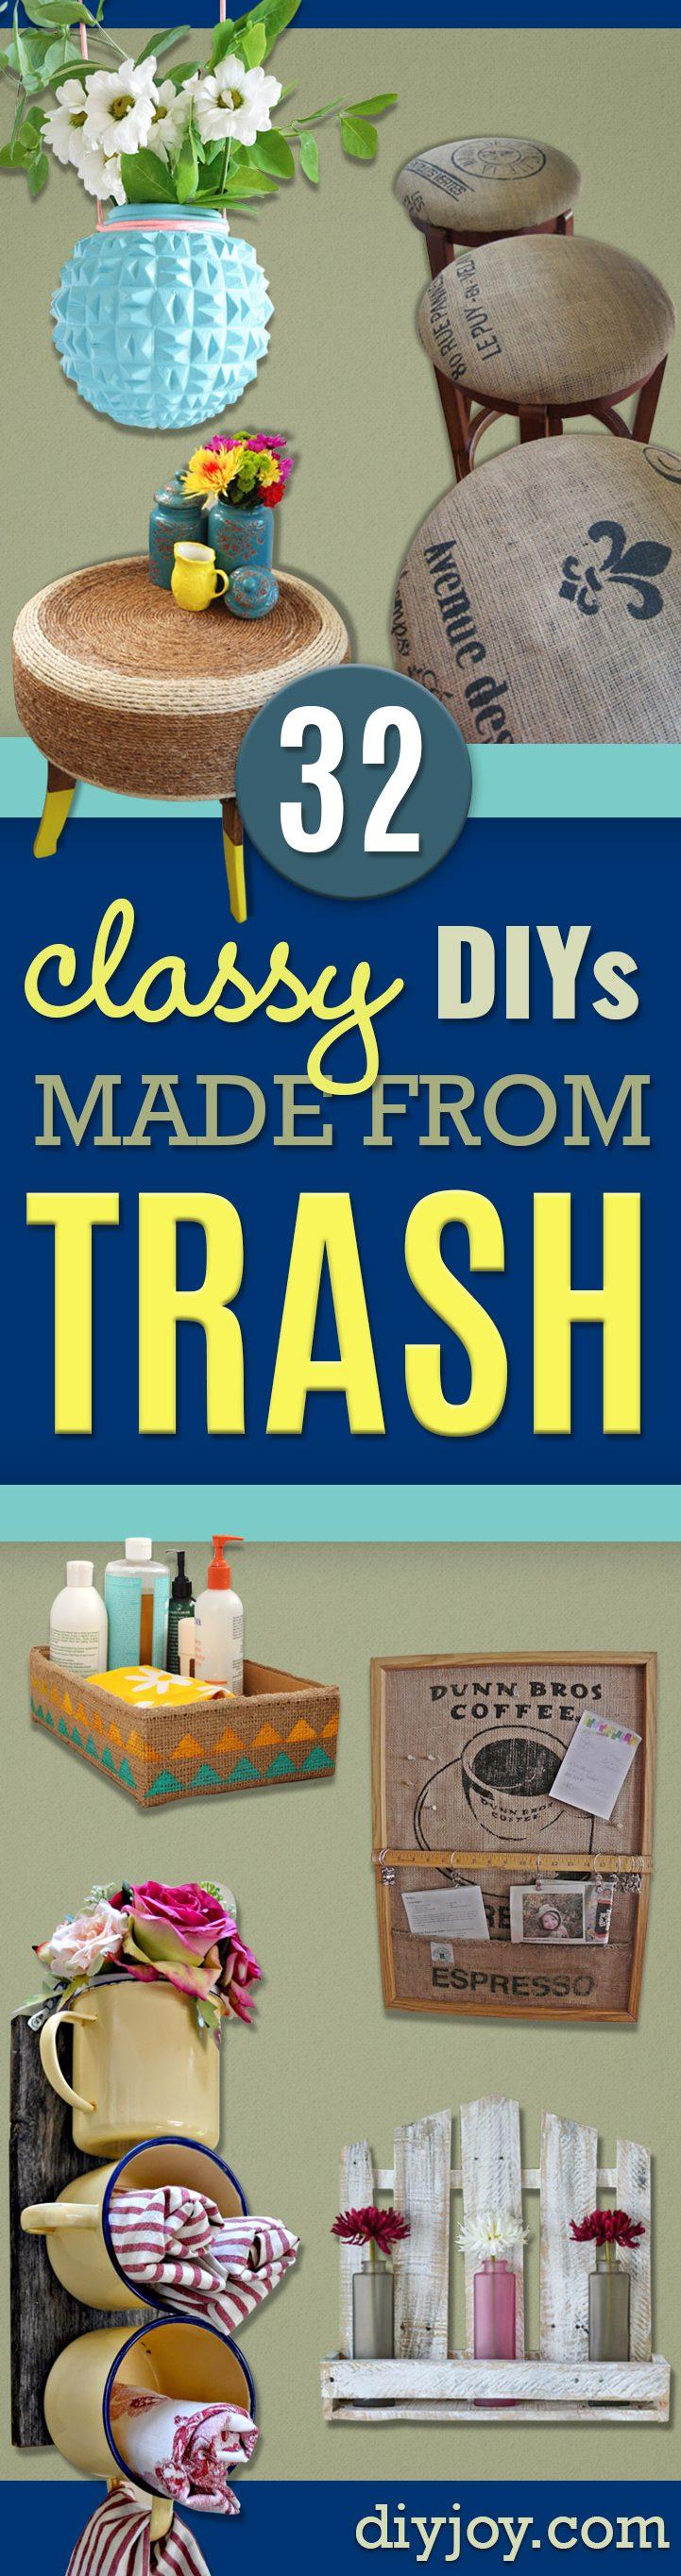 32 Classy DIYs Made From Trash